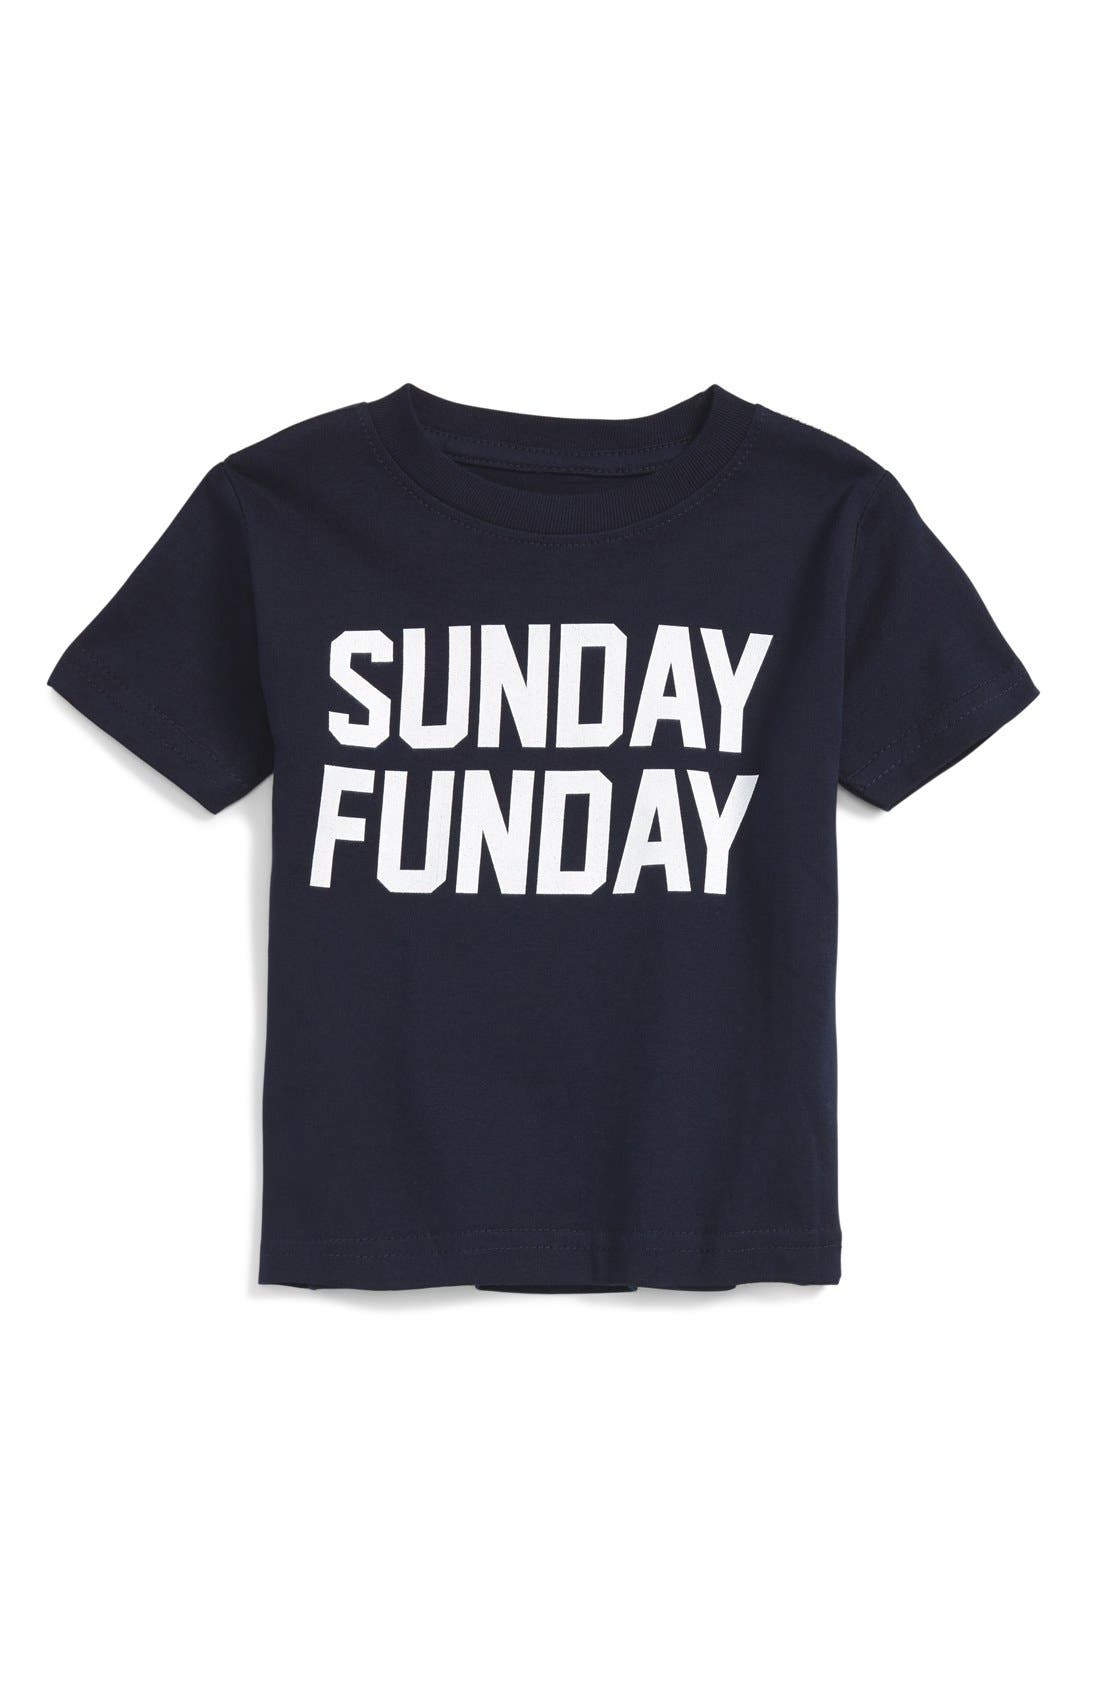 KID DANGEROUS 'Sunday Funday' Graphic T-Shirt